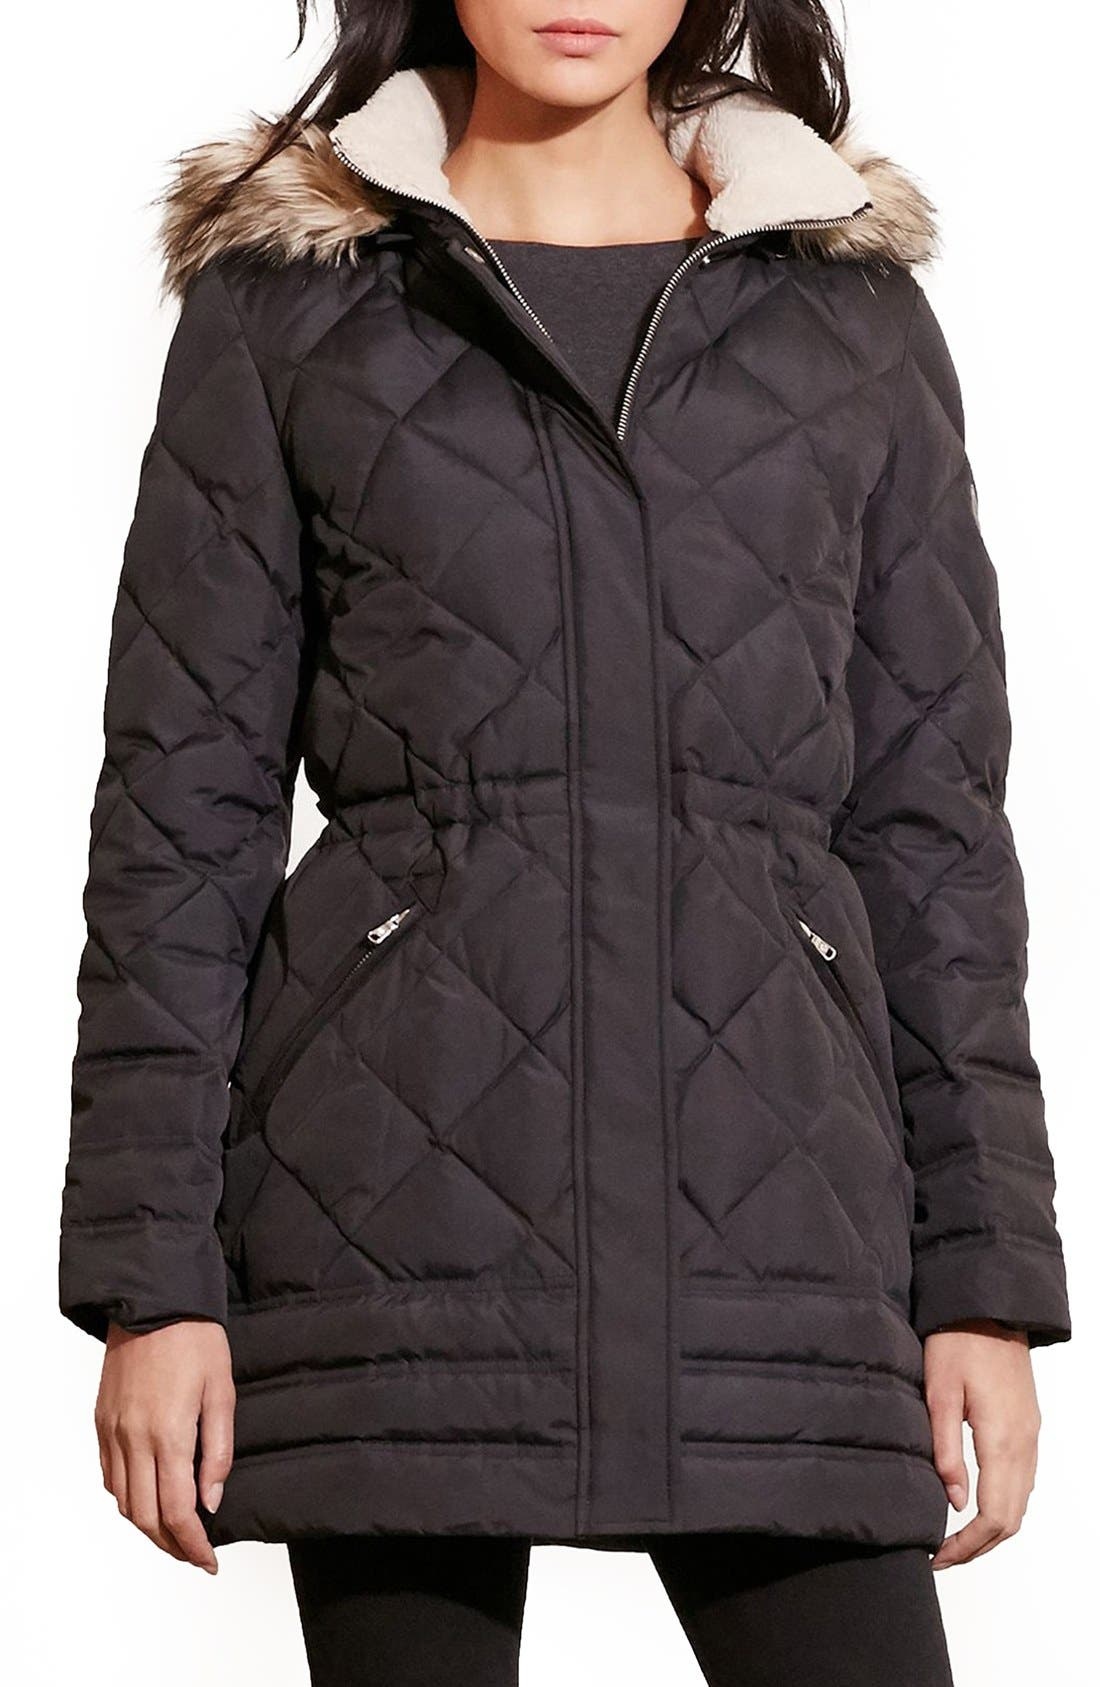 Main Image - Lauren Ralph Lauren Quilted Jacket with Faux Fur Trim